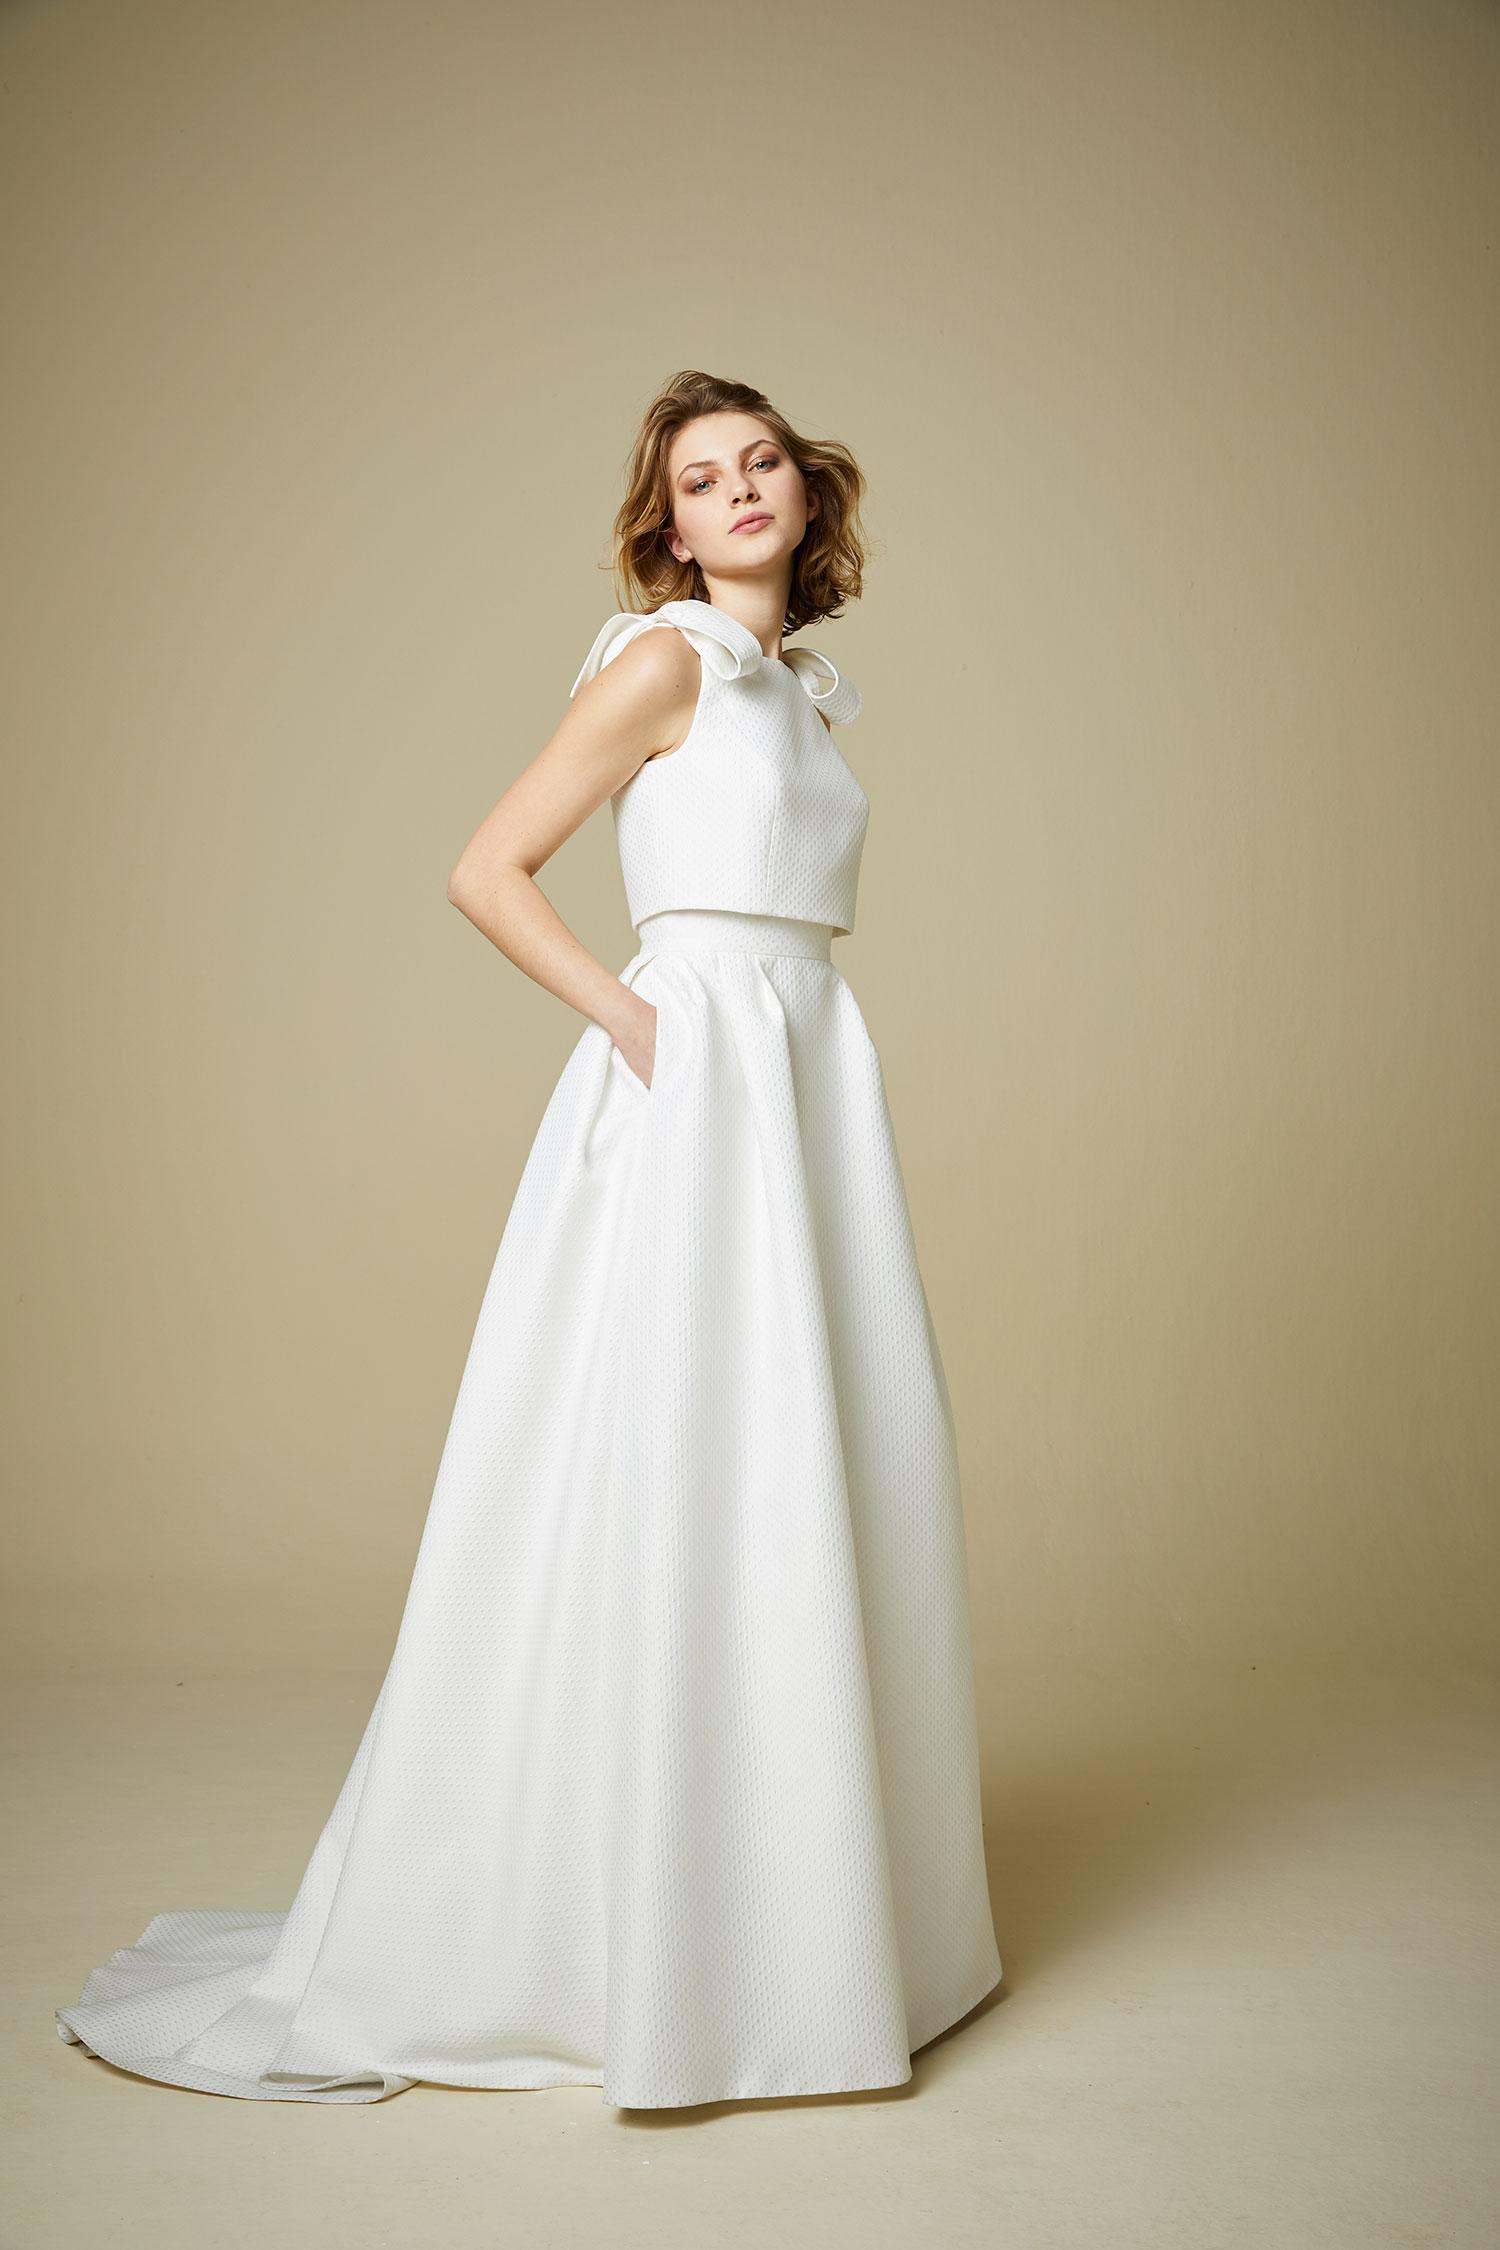 Jesus Peiro Wedding Dresses At Miss Bush Bridal Boutique